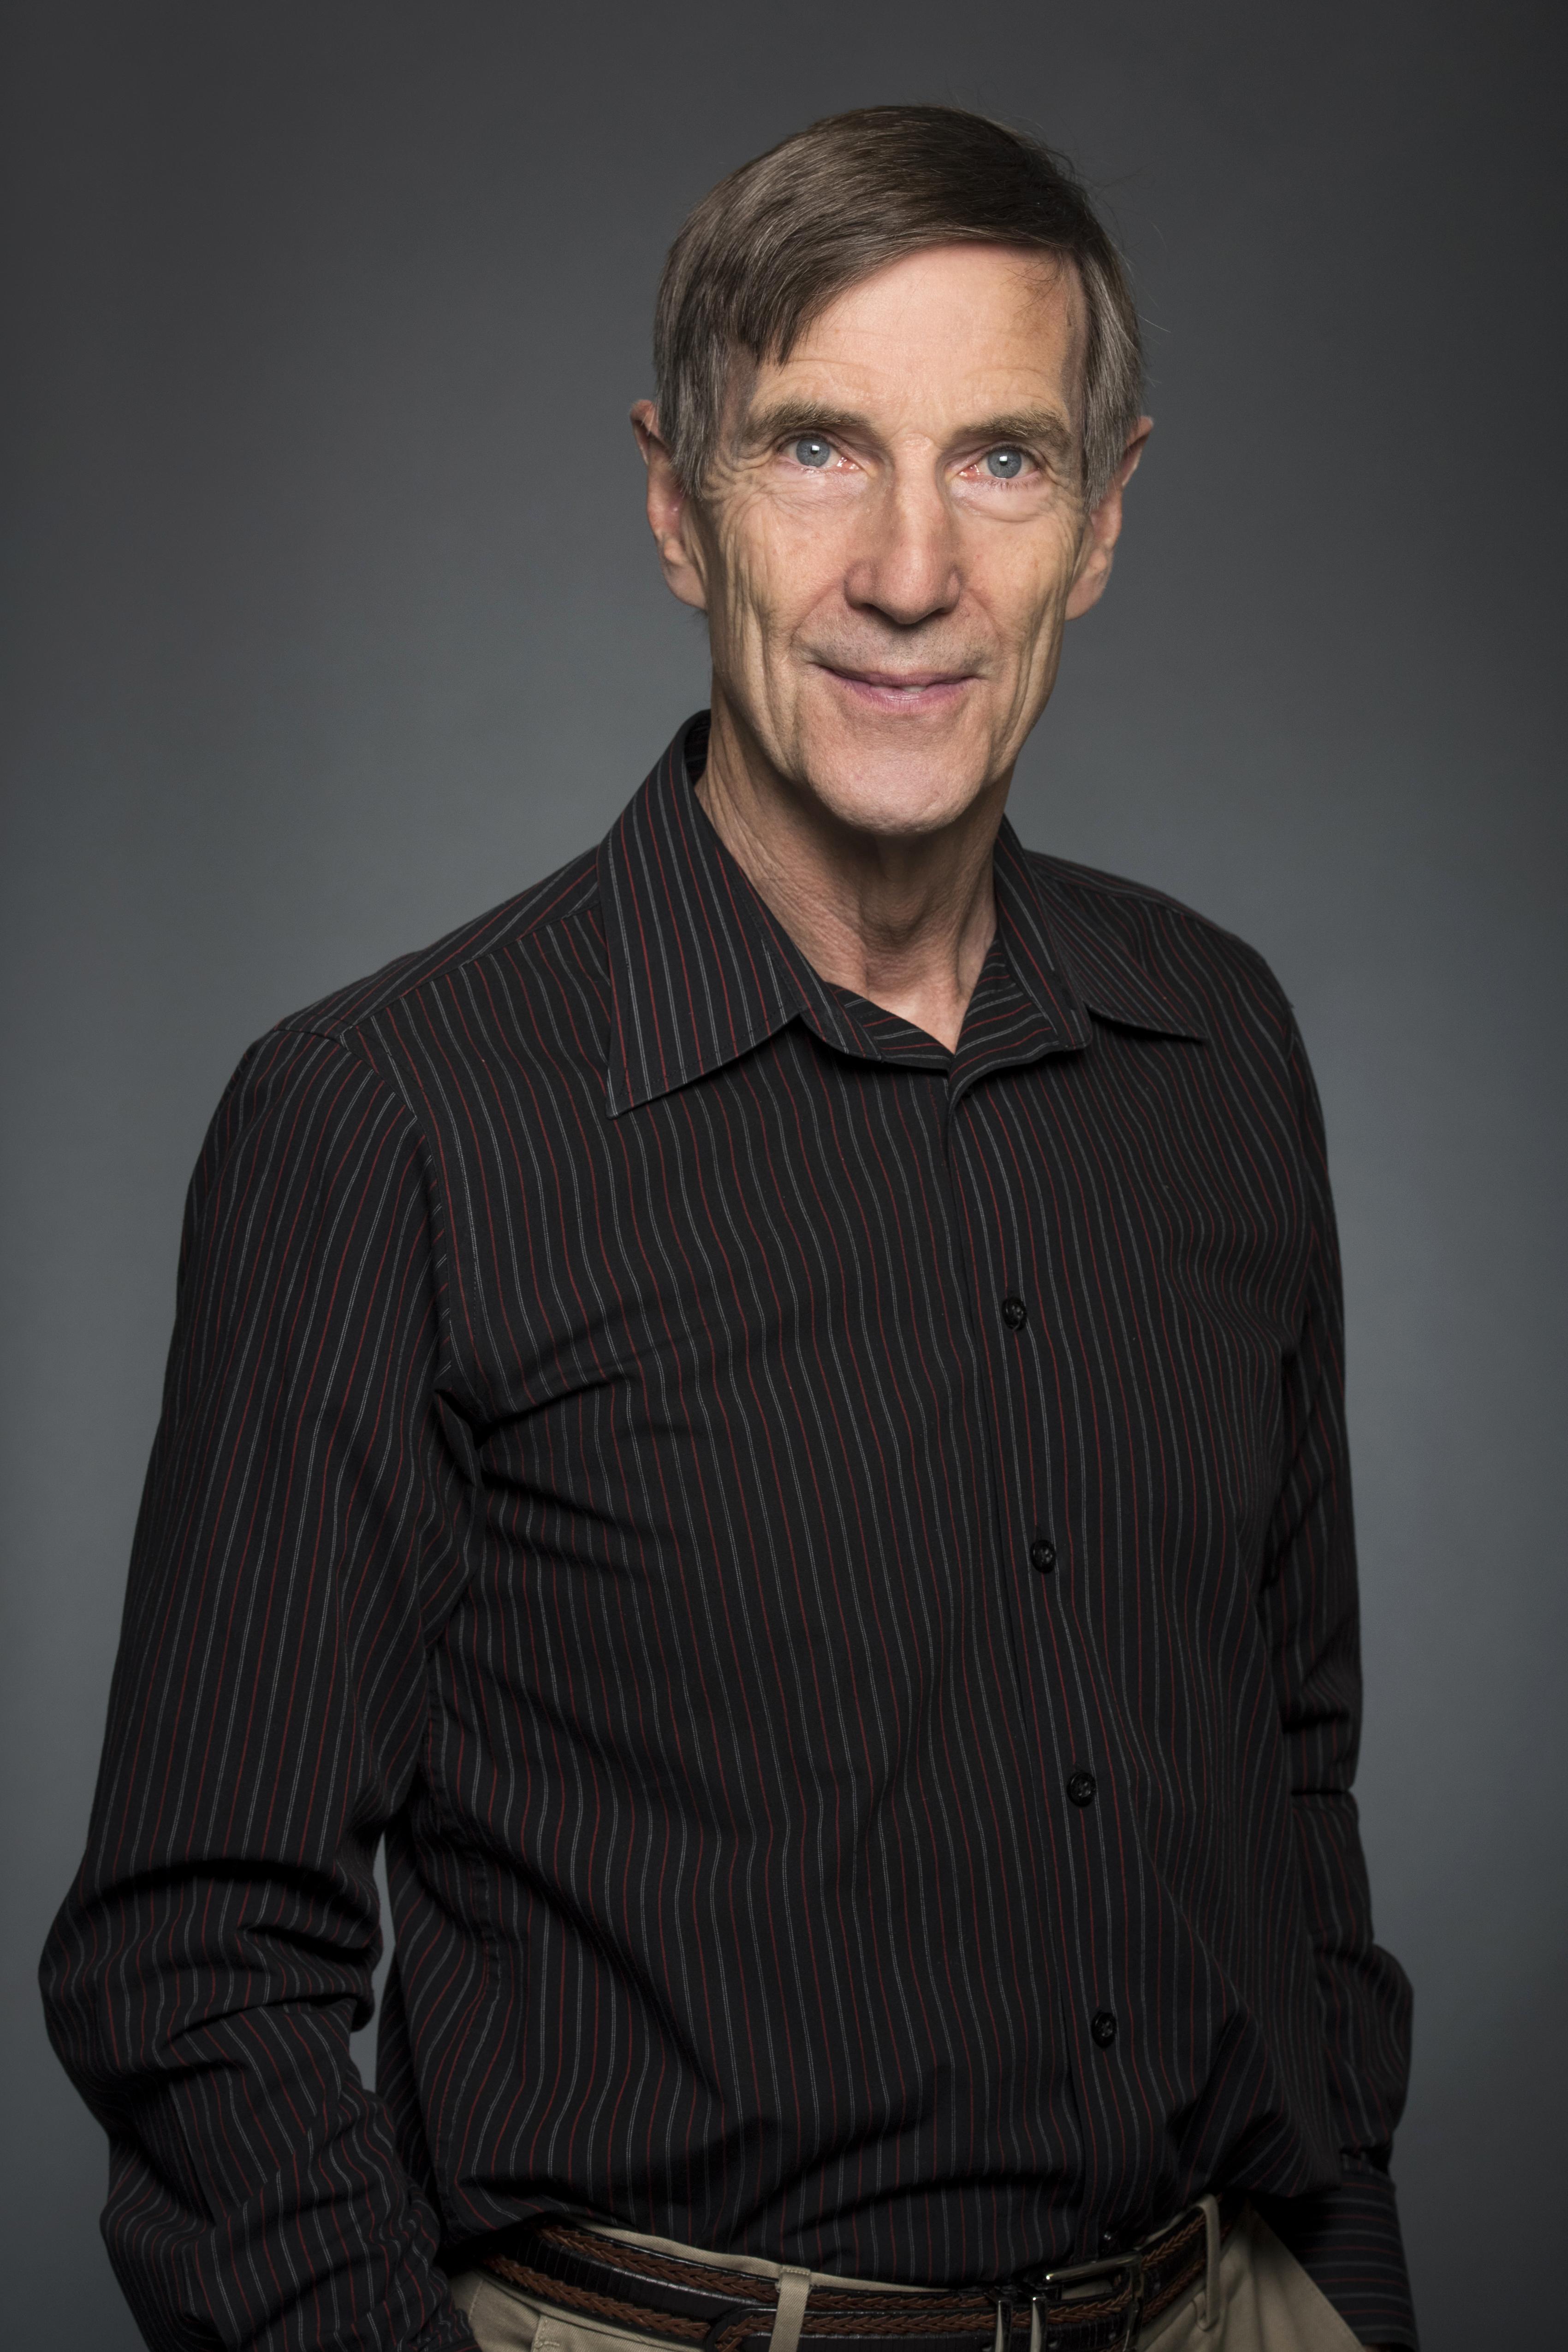 Dr. Ian McDowell